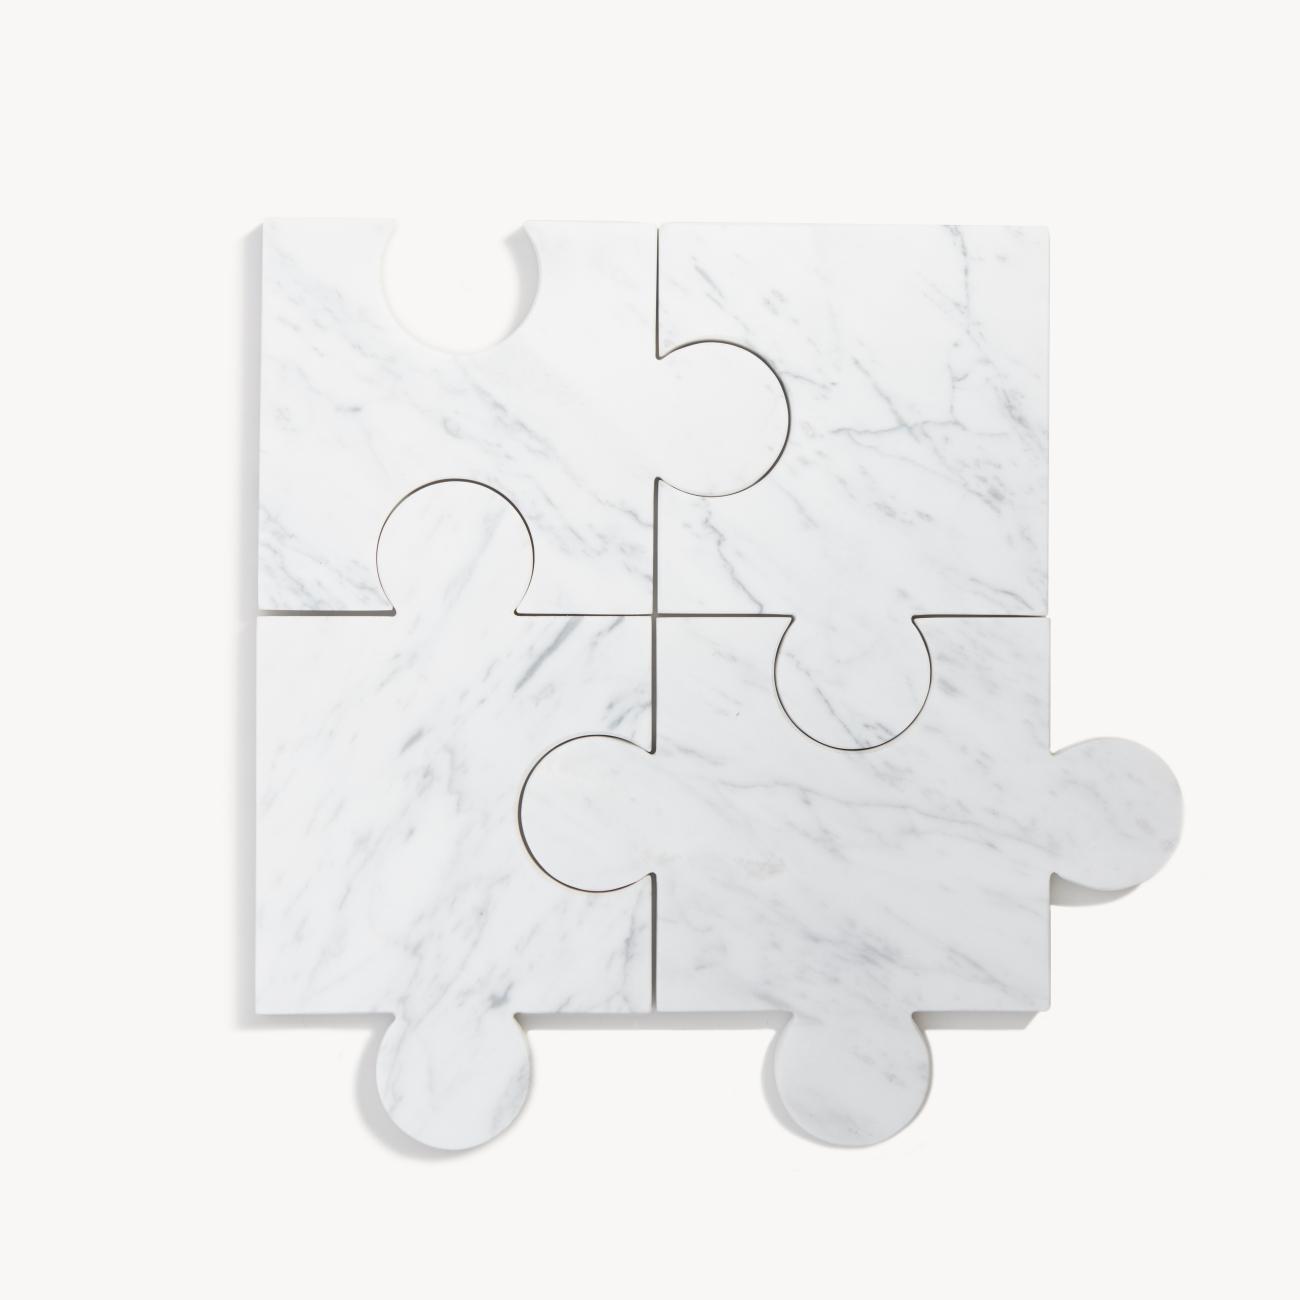 Detail 2 / Stonecut Puzzle Coasters